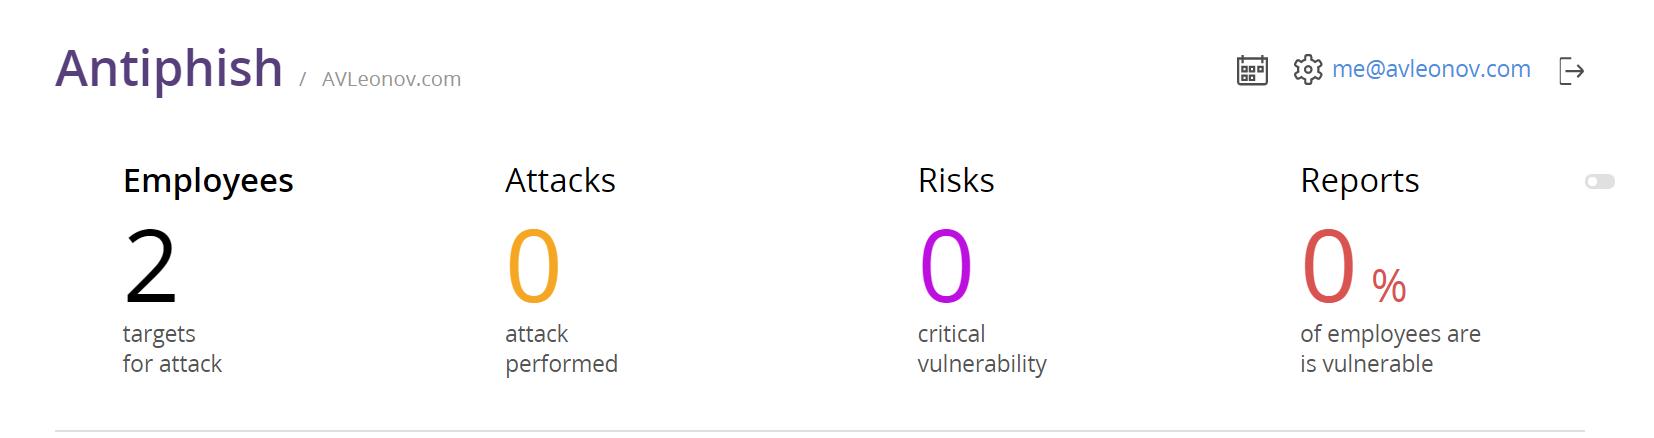 Antiphish dashboard: Employees, Attacks, Risks, Repors